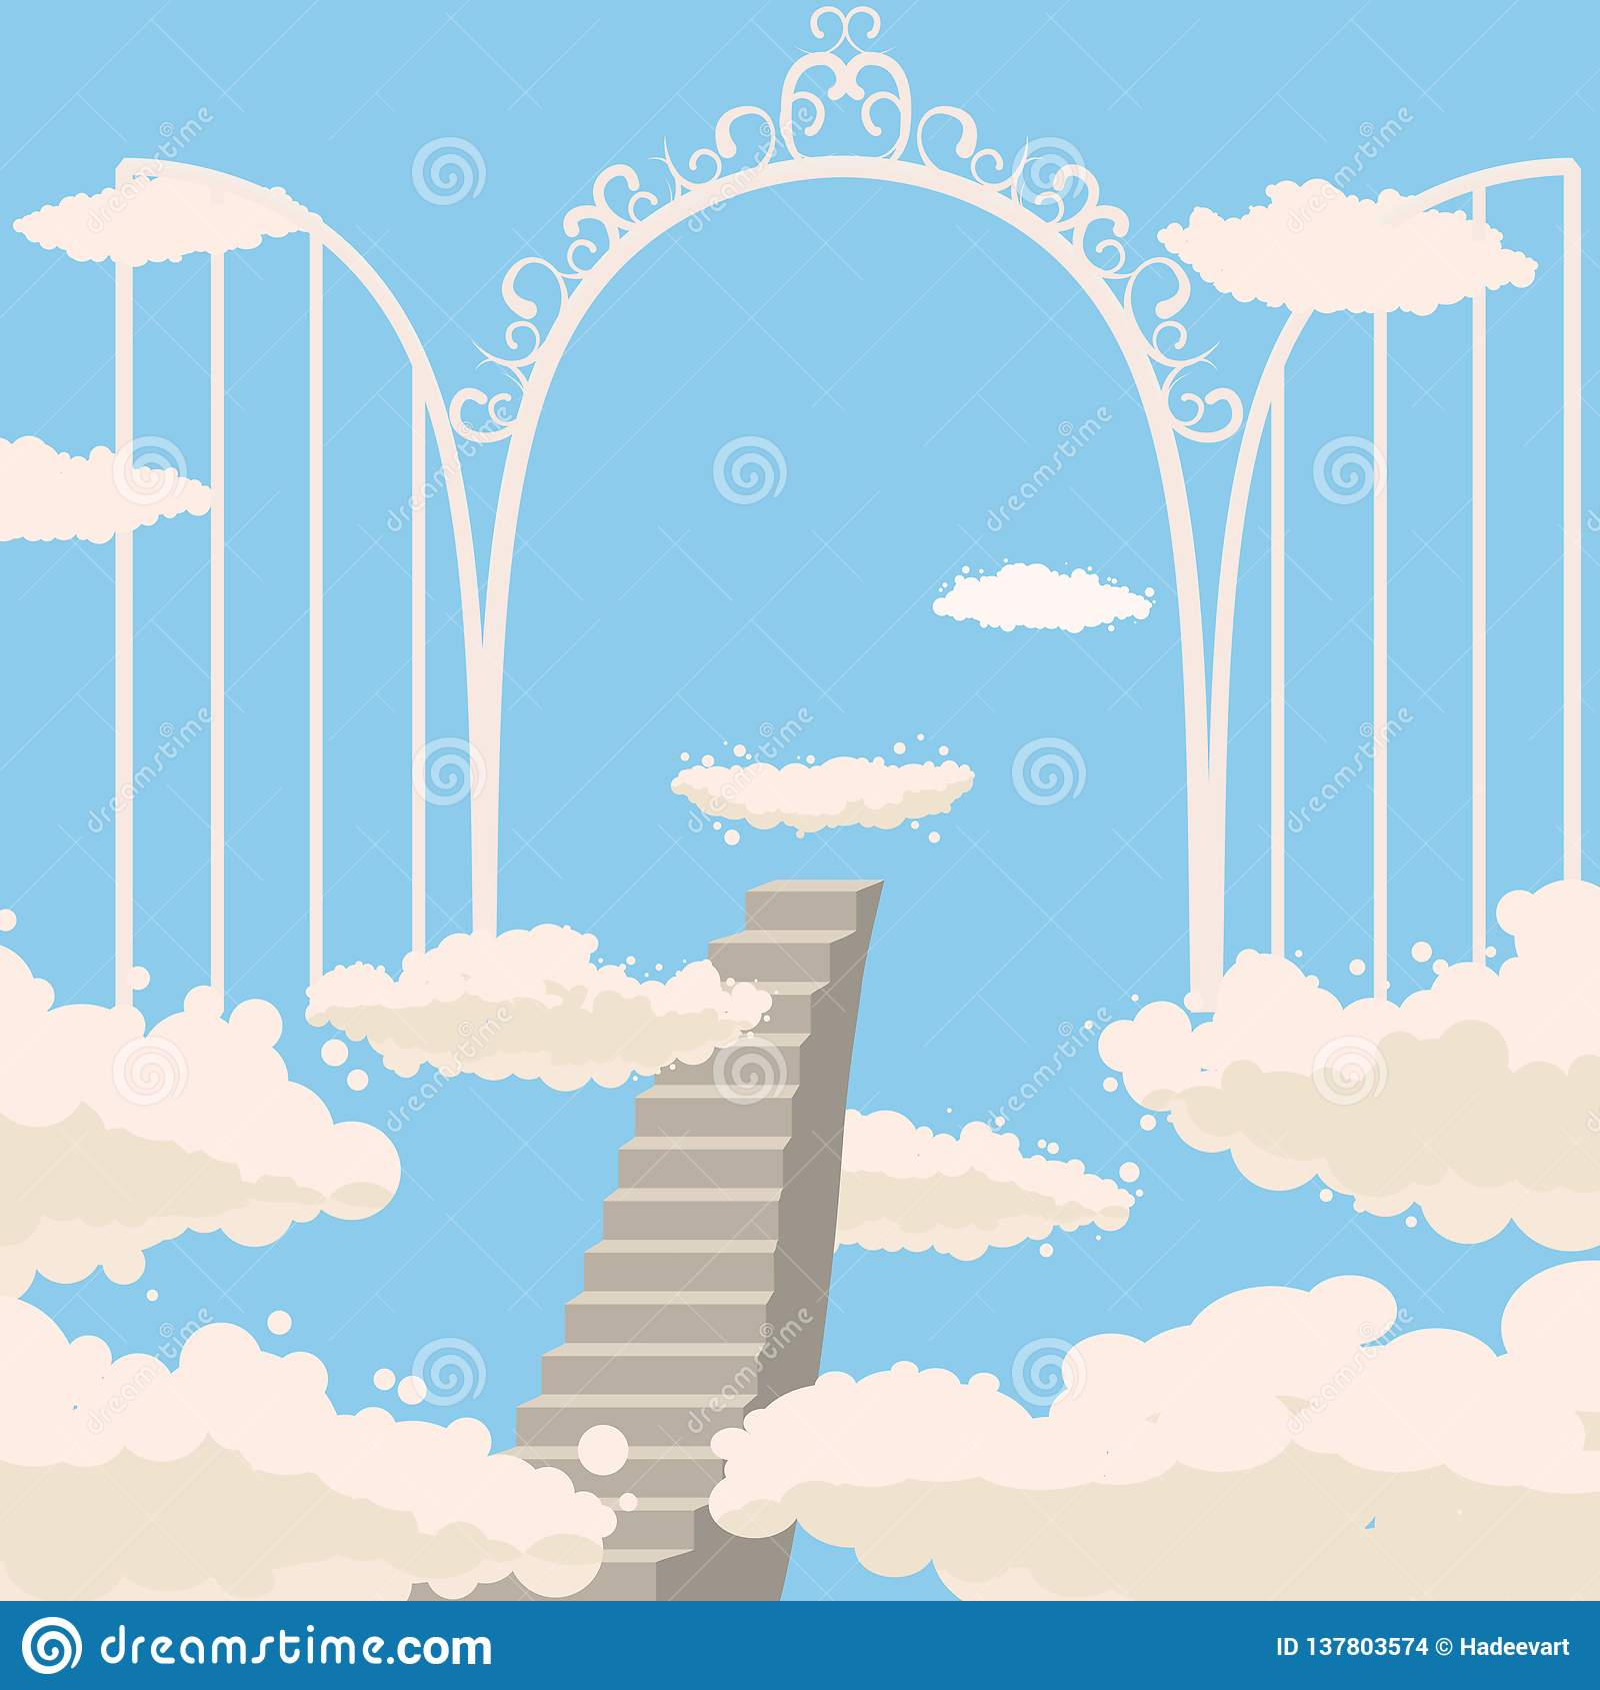 Straße, Treppe zum Himmel, offene Tore des Himmels, Himmel, Wolken, Christentum, Vektor, lokalisiert, Karikaturart